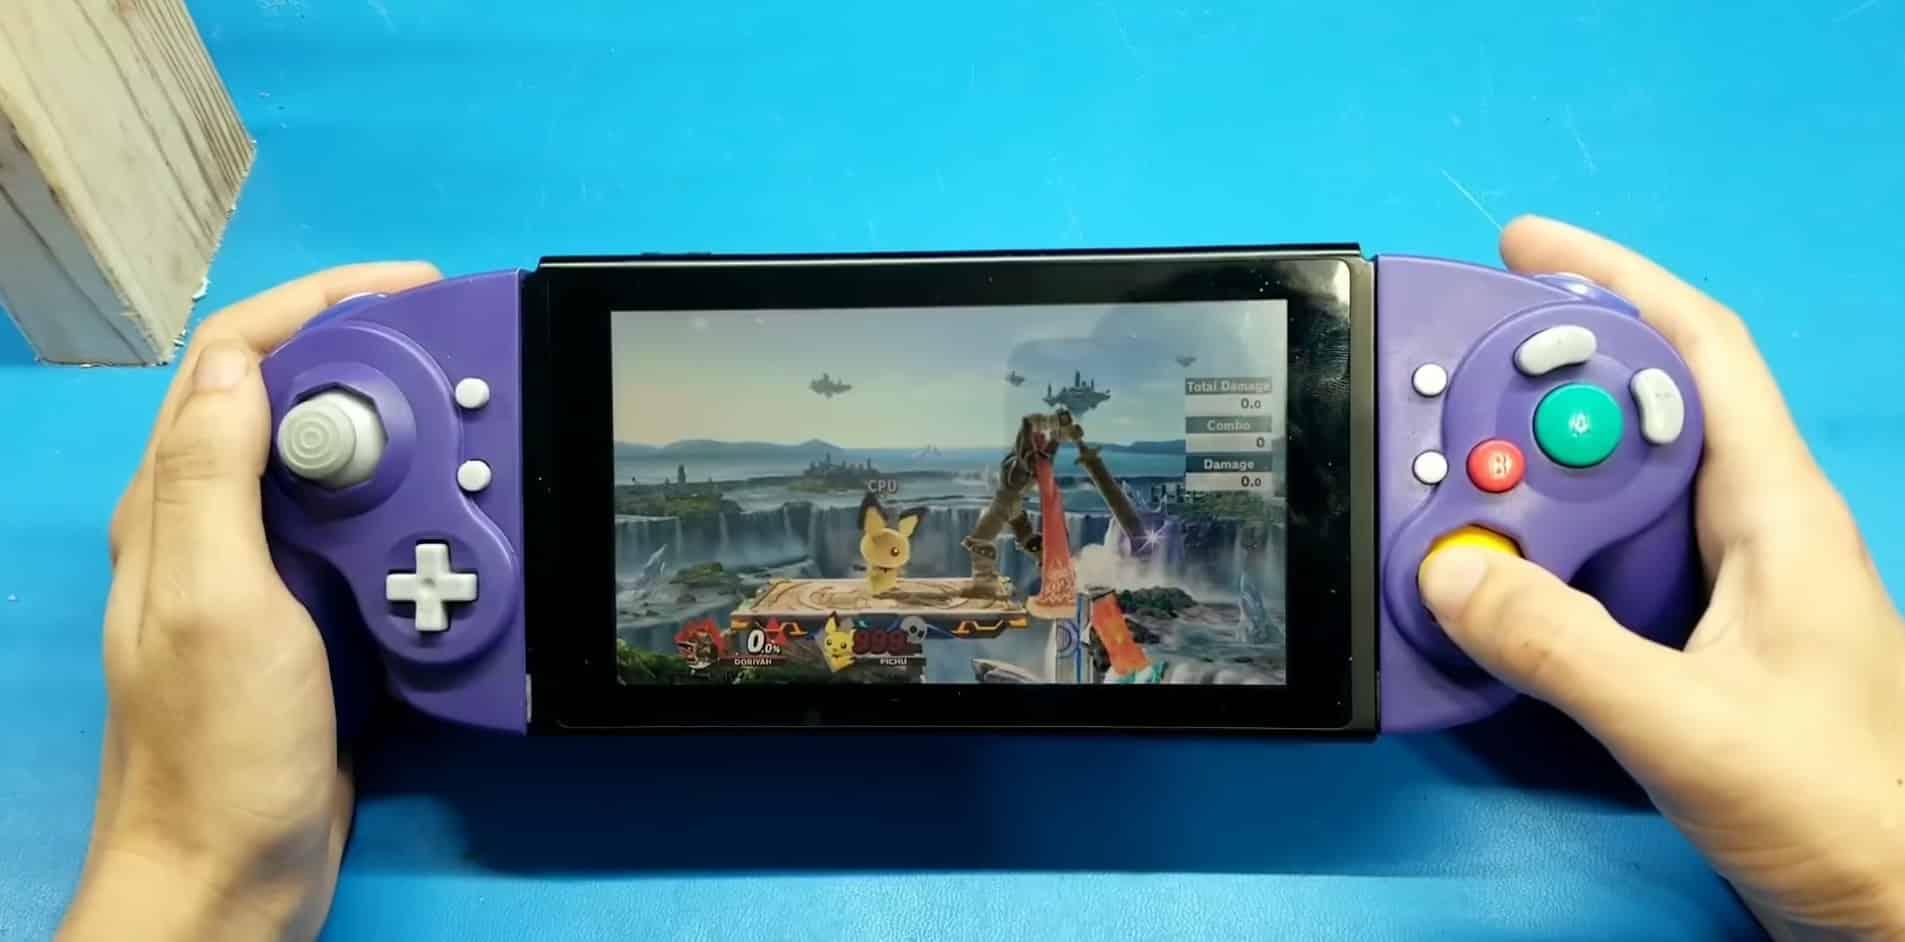 GameCube, Nintendo Switch, Mod, Joy-Con, Shank Mods super smash bros